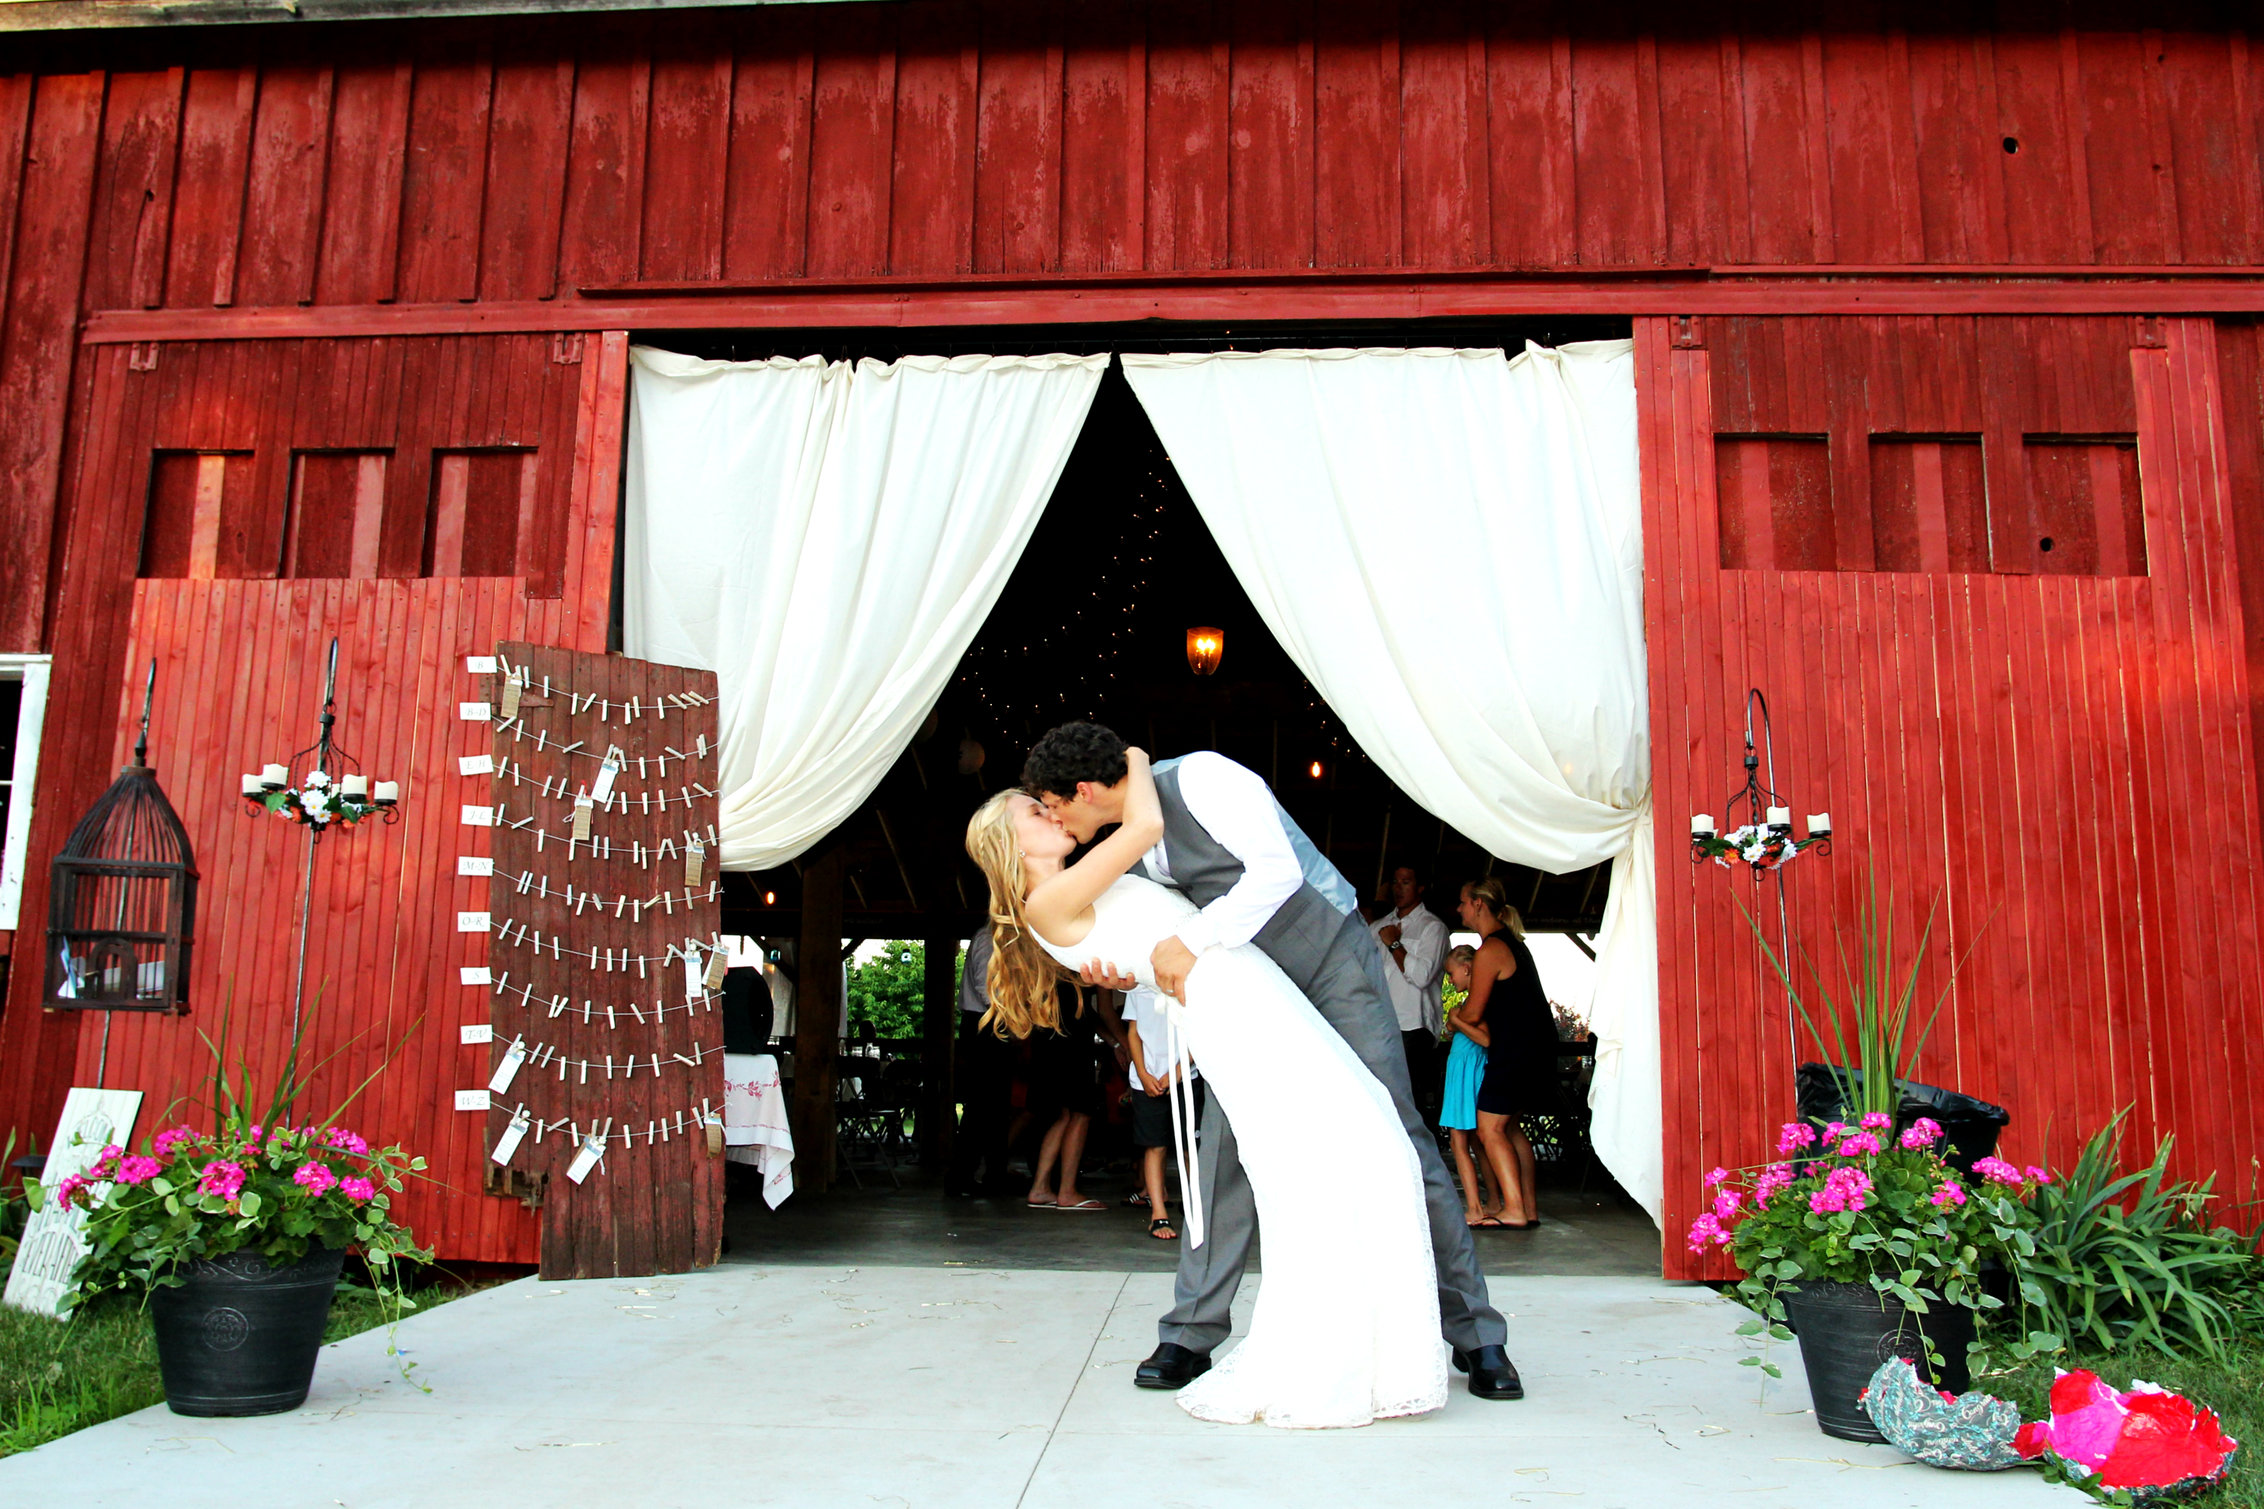 Blodgett Wedding Barn   Michigan Rustic Wedding Venues